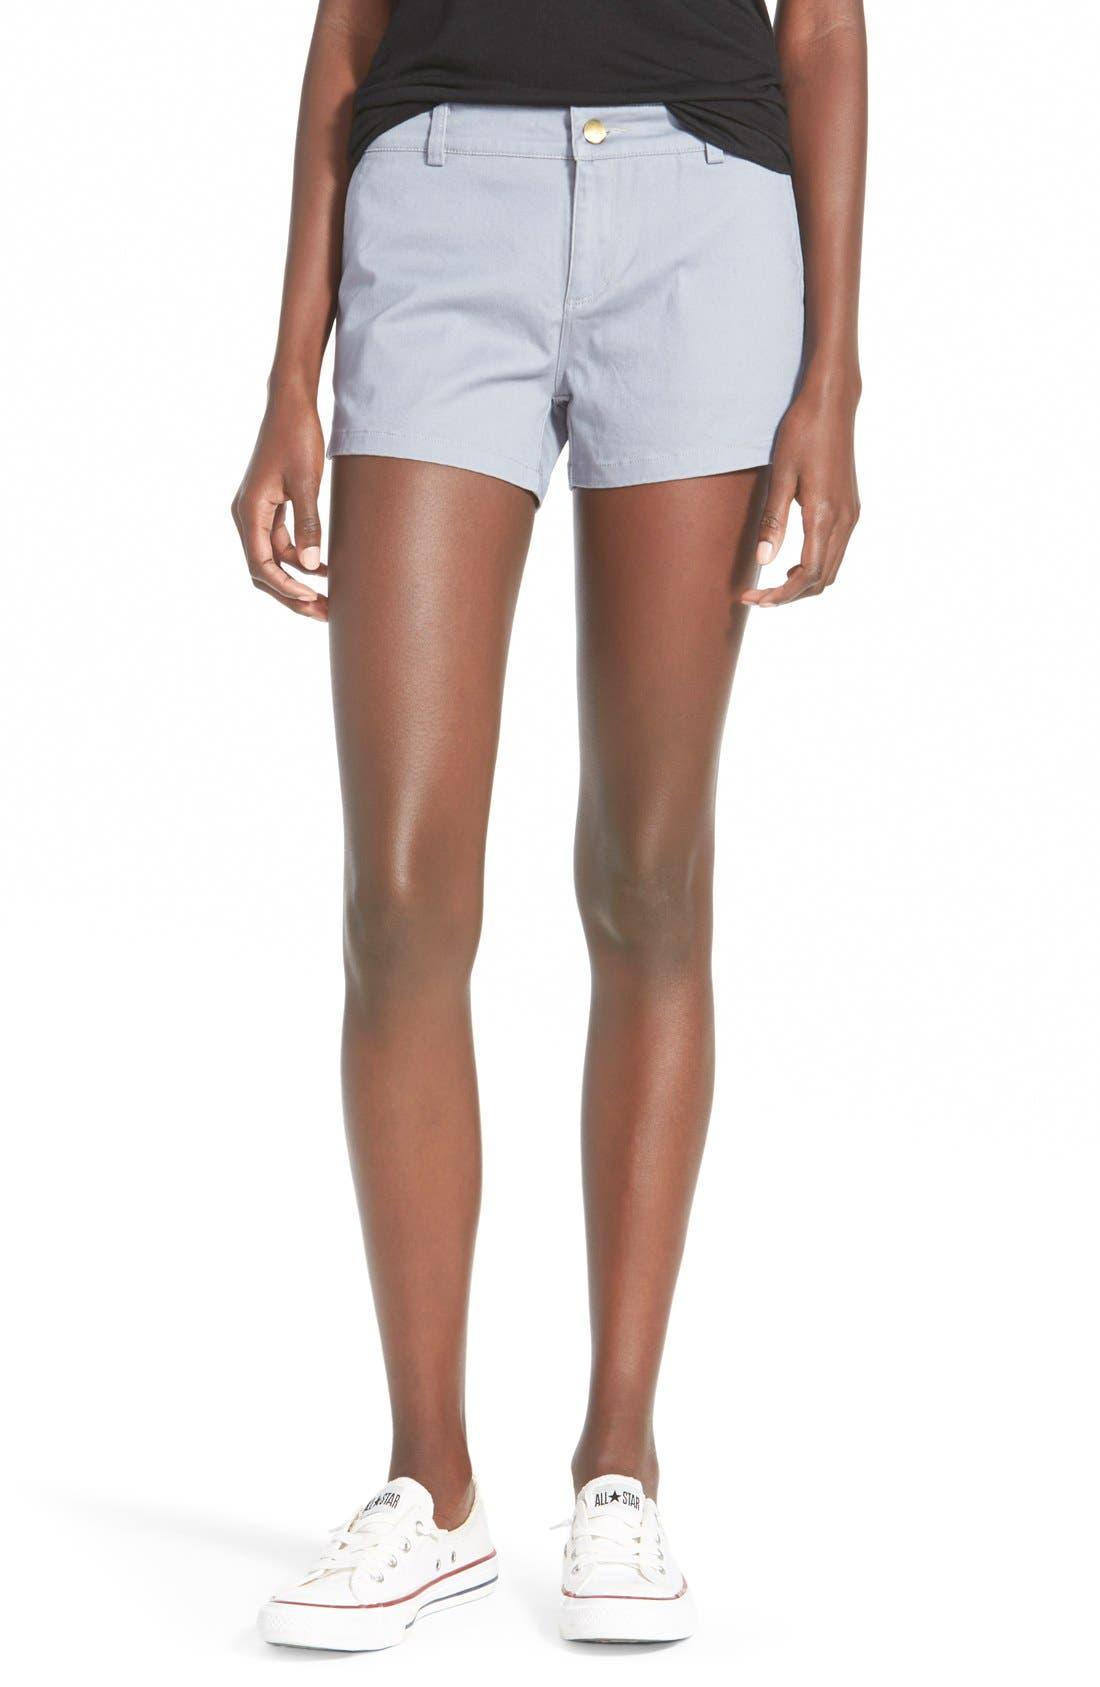 Alternate Image 1 Selected - The Hanger Woven Shorts